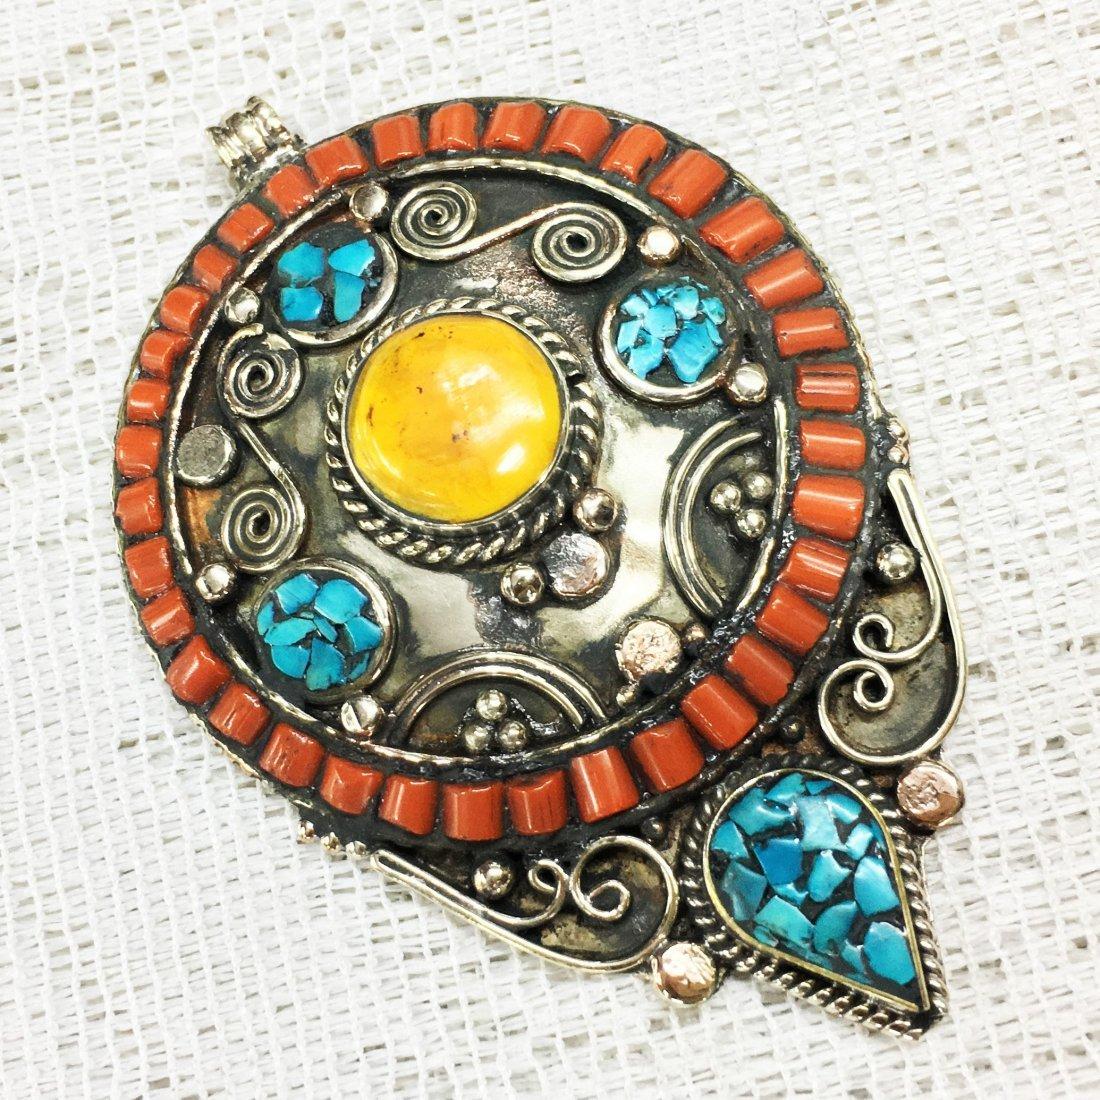 Turquoise & Amber Beads Handmade Pendant